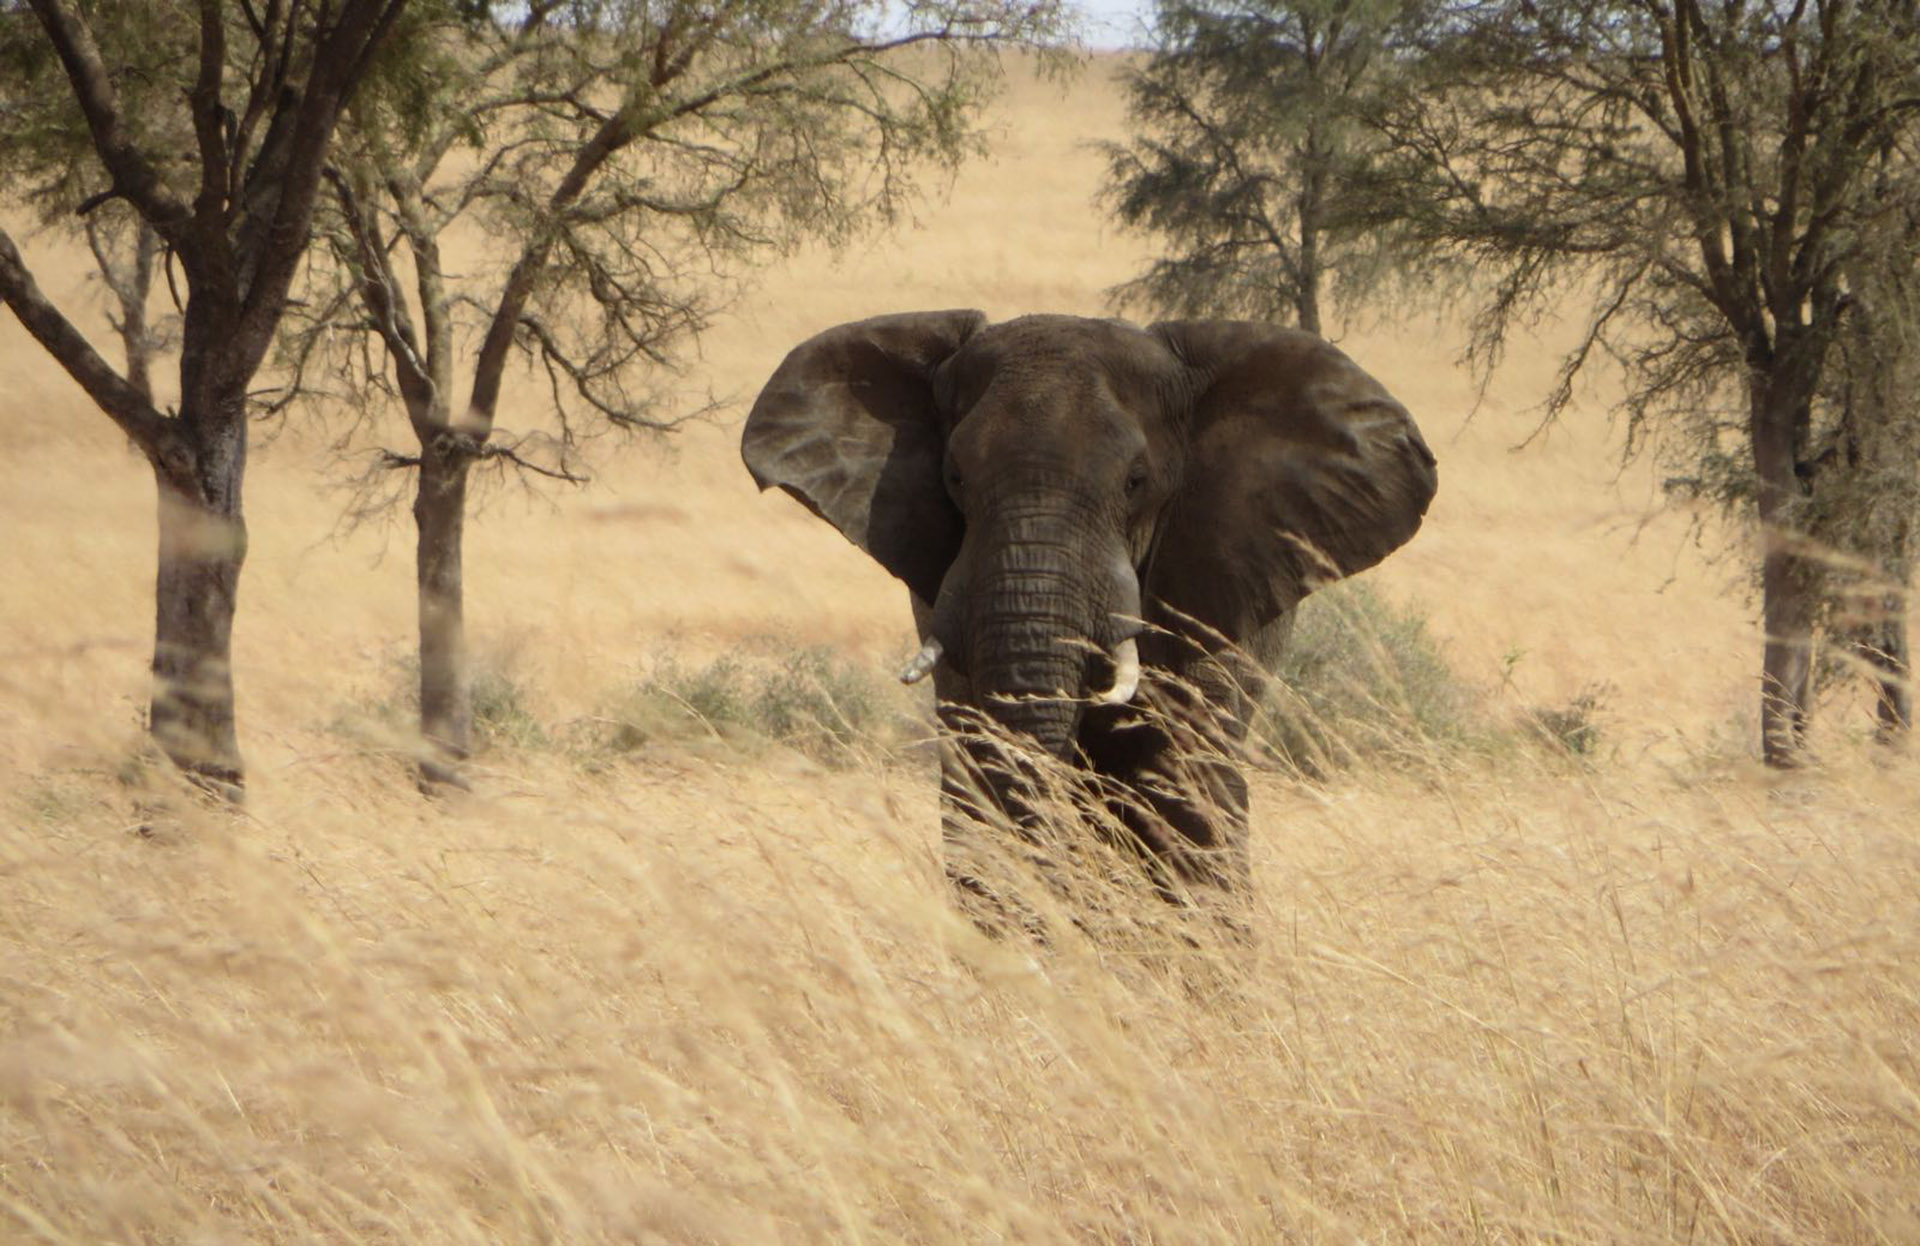 kitgum dag10 olifant 1920